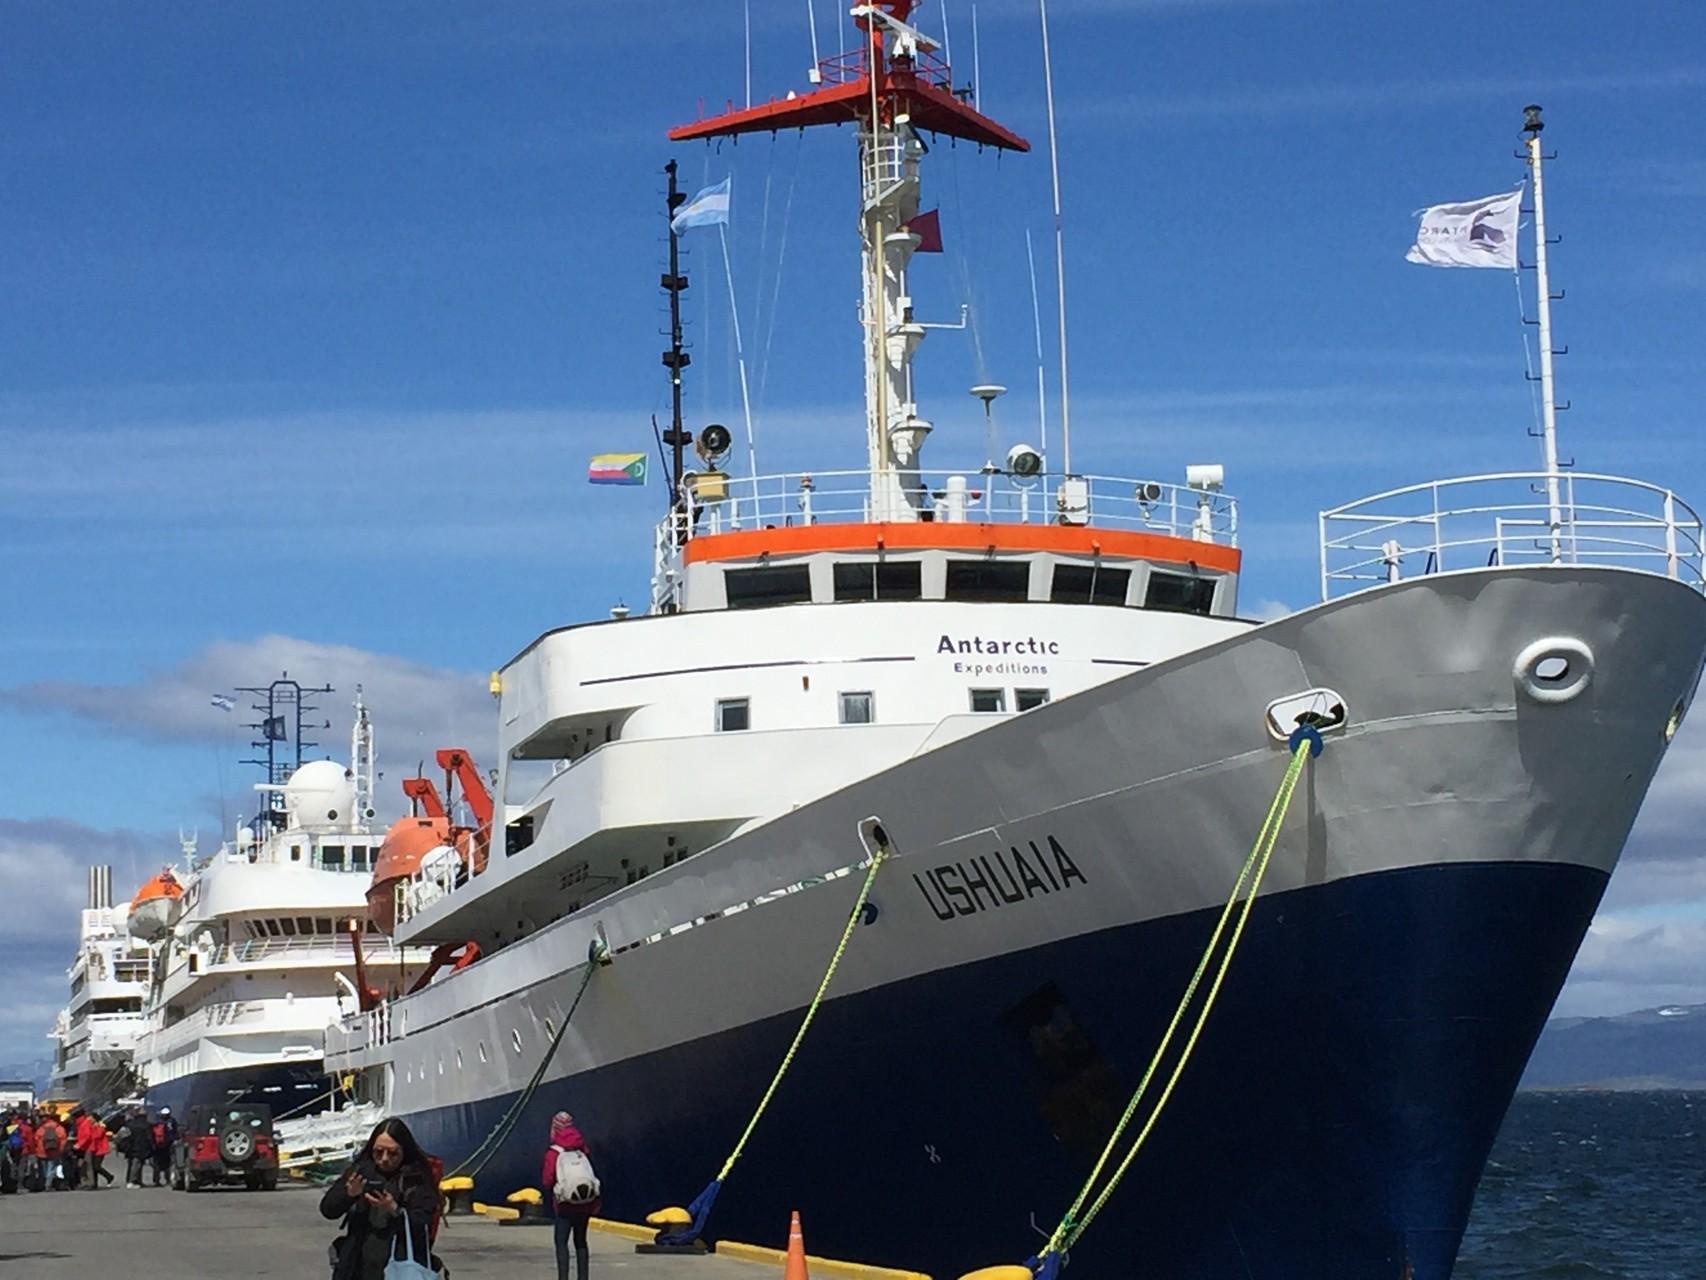 Ushuaia am Hafen